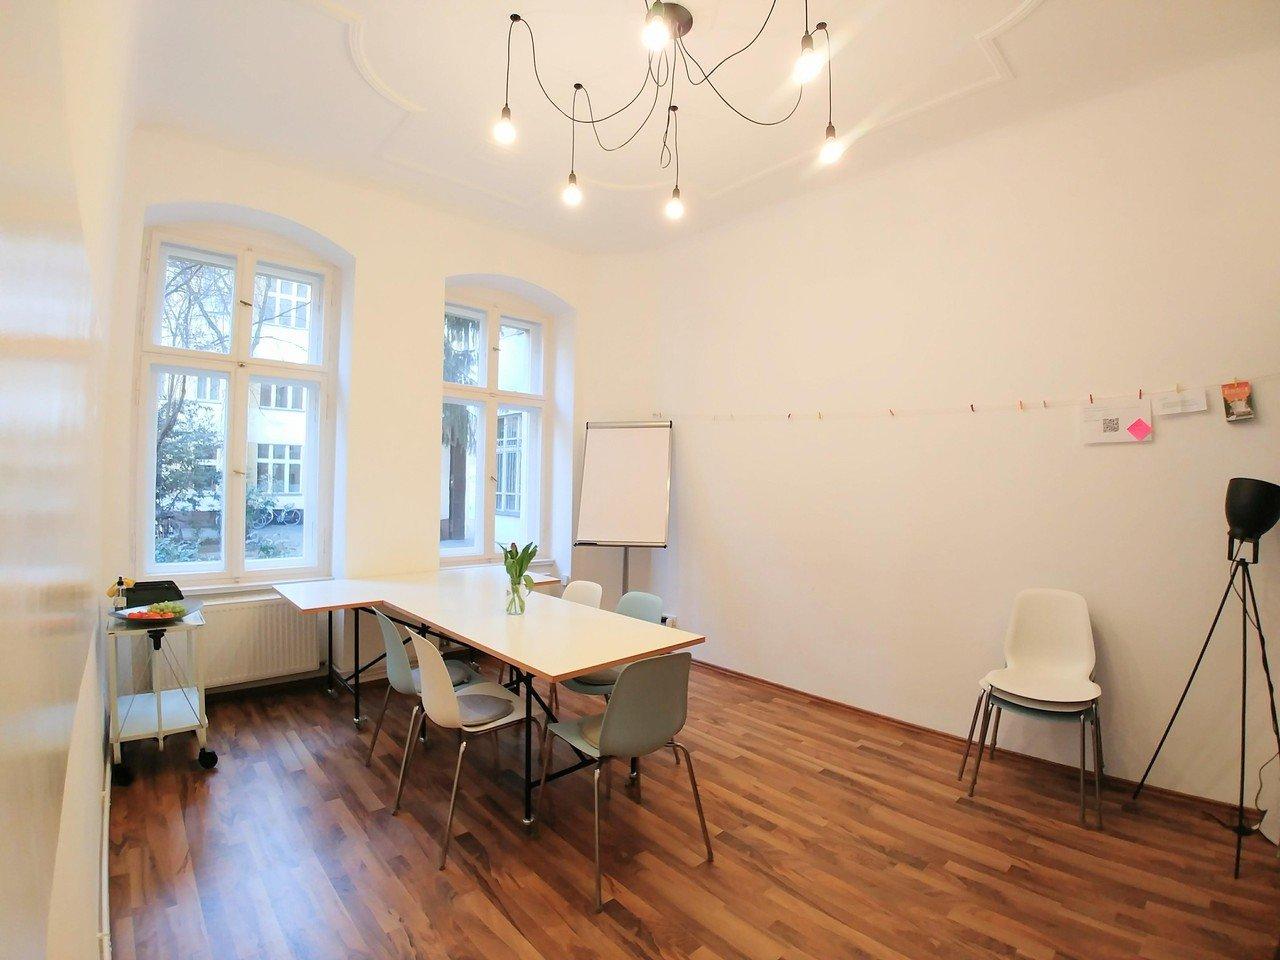 Berlin Besprechungsräume Meeting room spreegut image 20